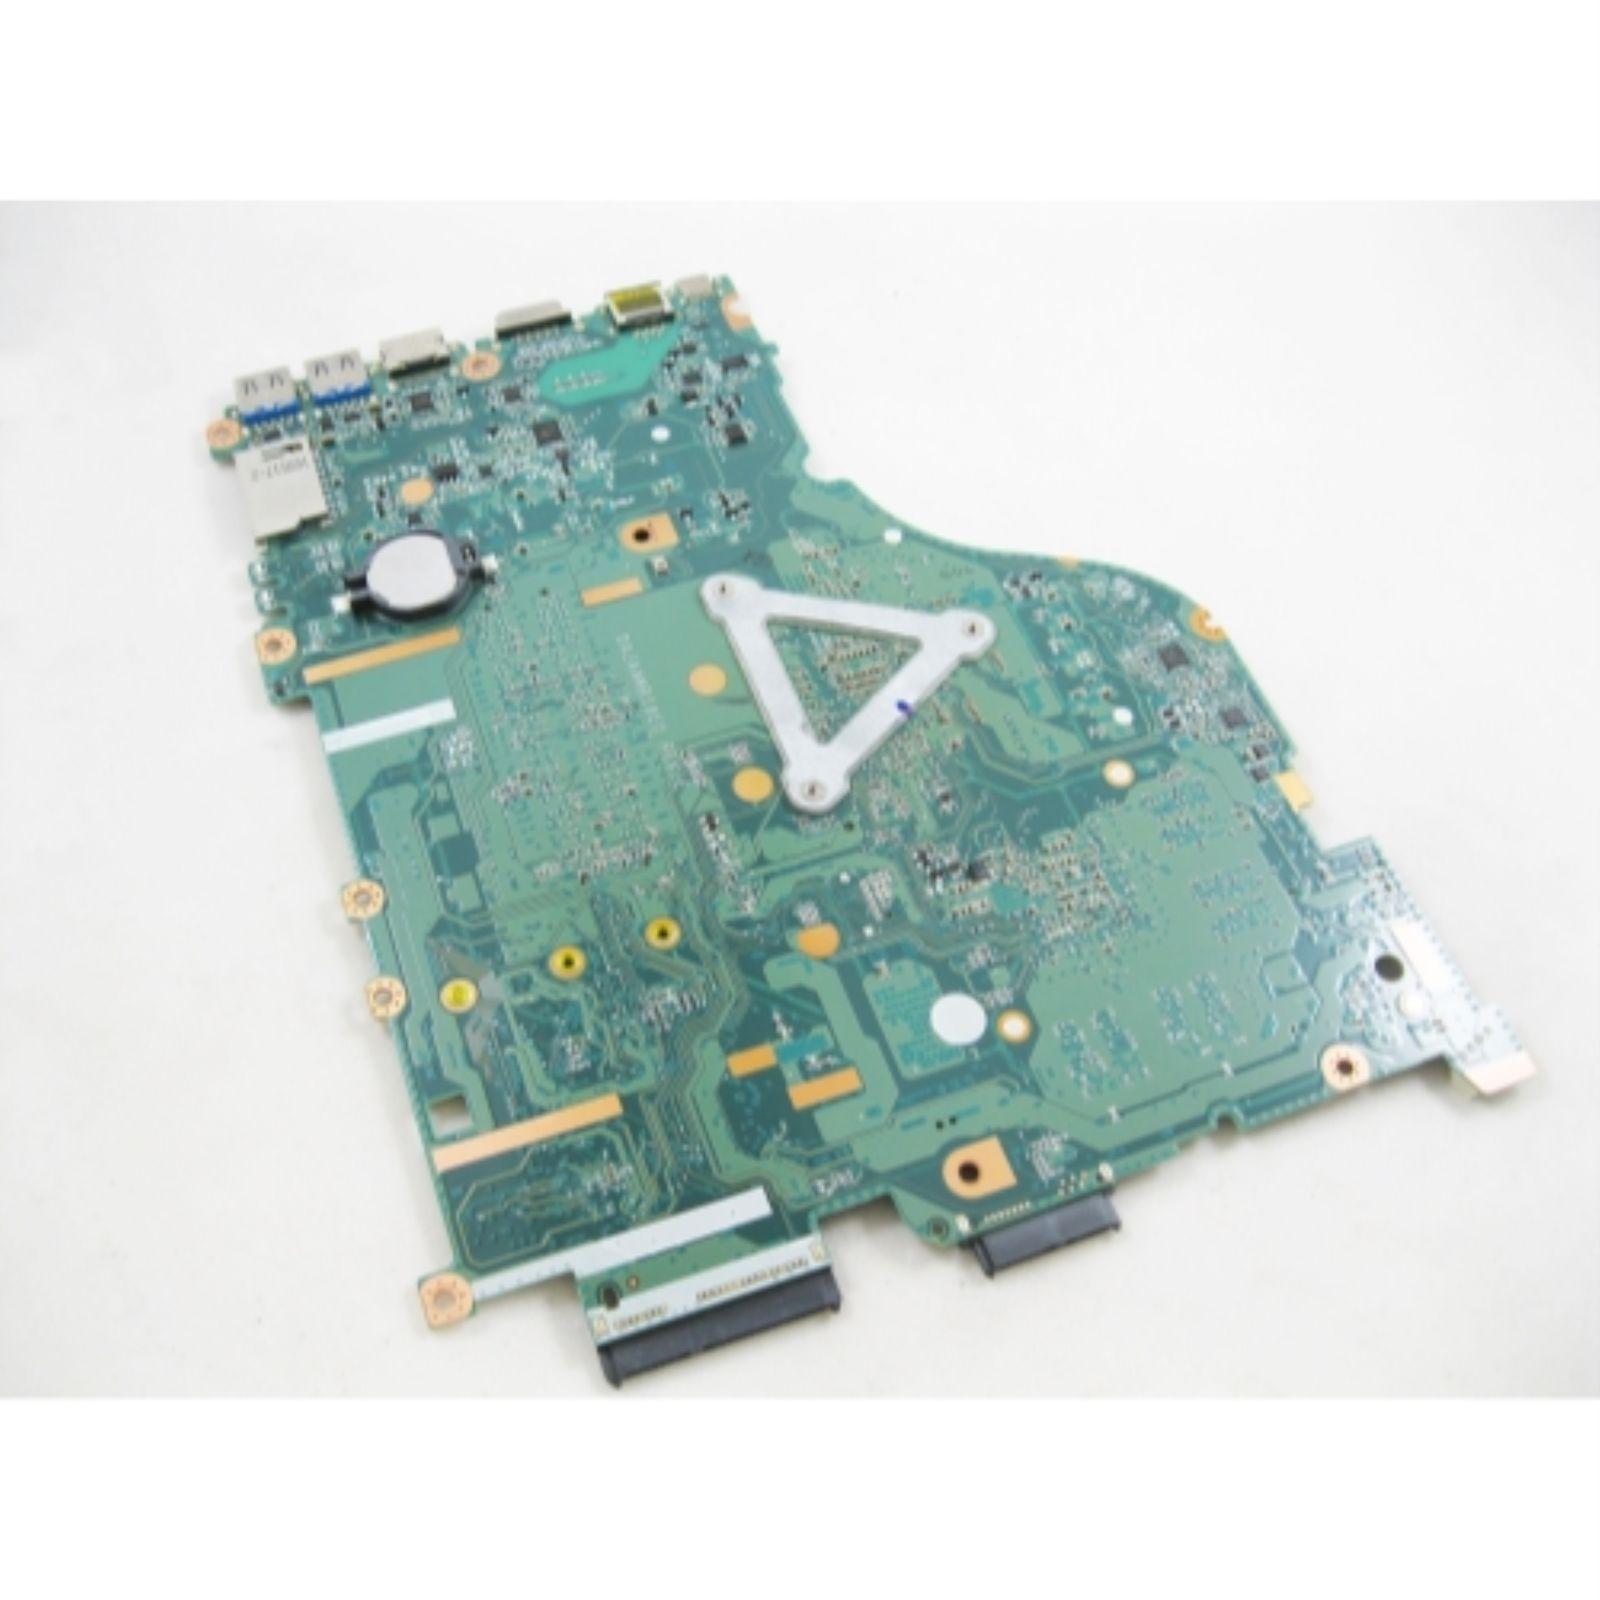 NBGDW110046 DAZAAMB16E0 For font b acer b font aspire F5 573G Laptop motherboard SR2EY I5 6200U